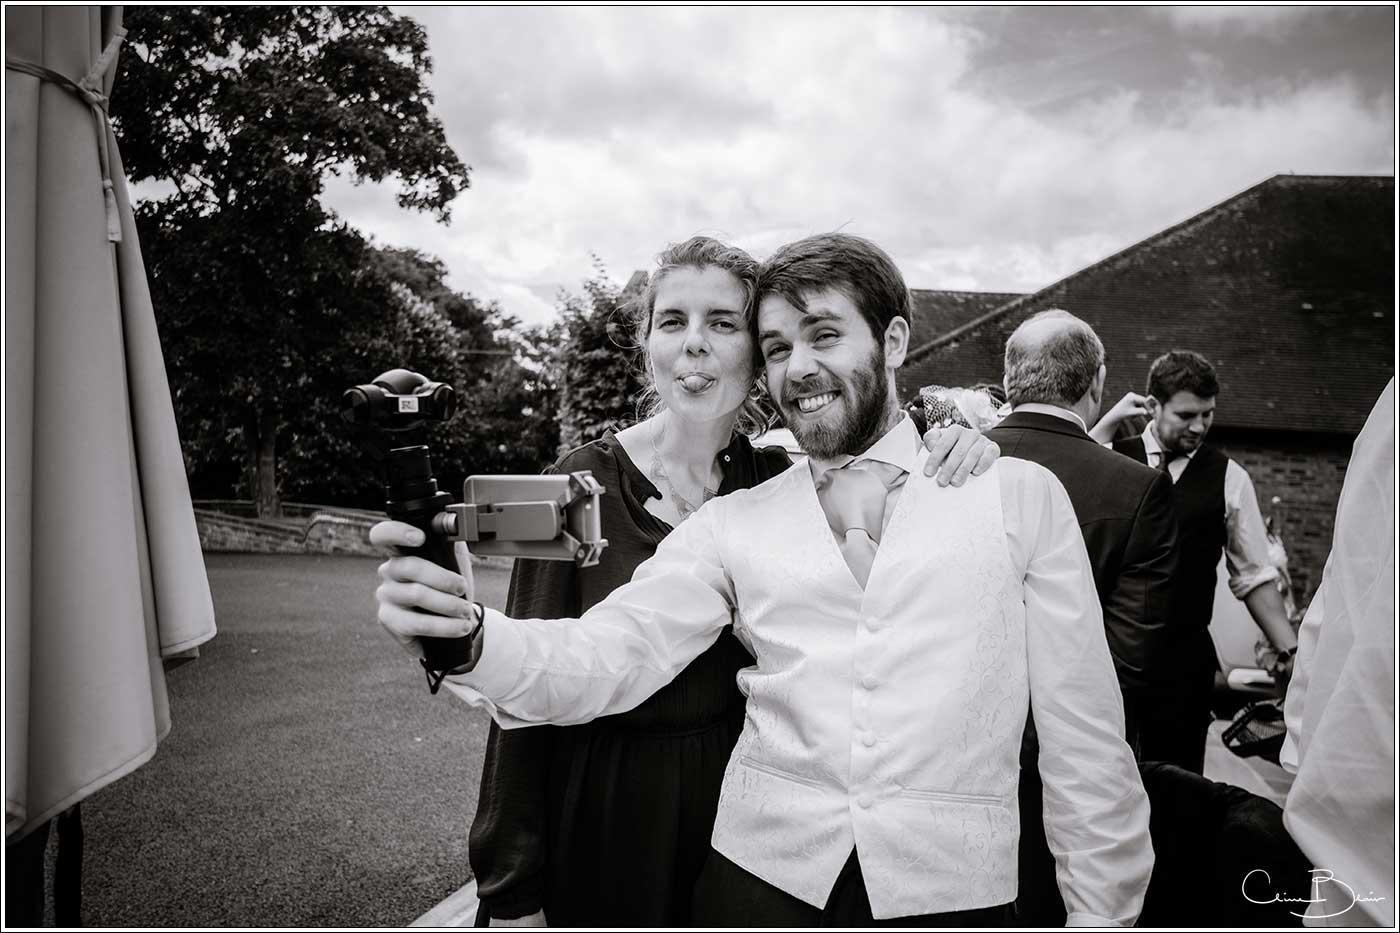 Man and woman taking selfie: Bank House Wedding Photographer Clive Blair Photography. Documentary Birmingham Wedding Photographer